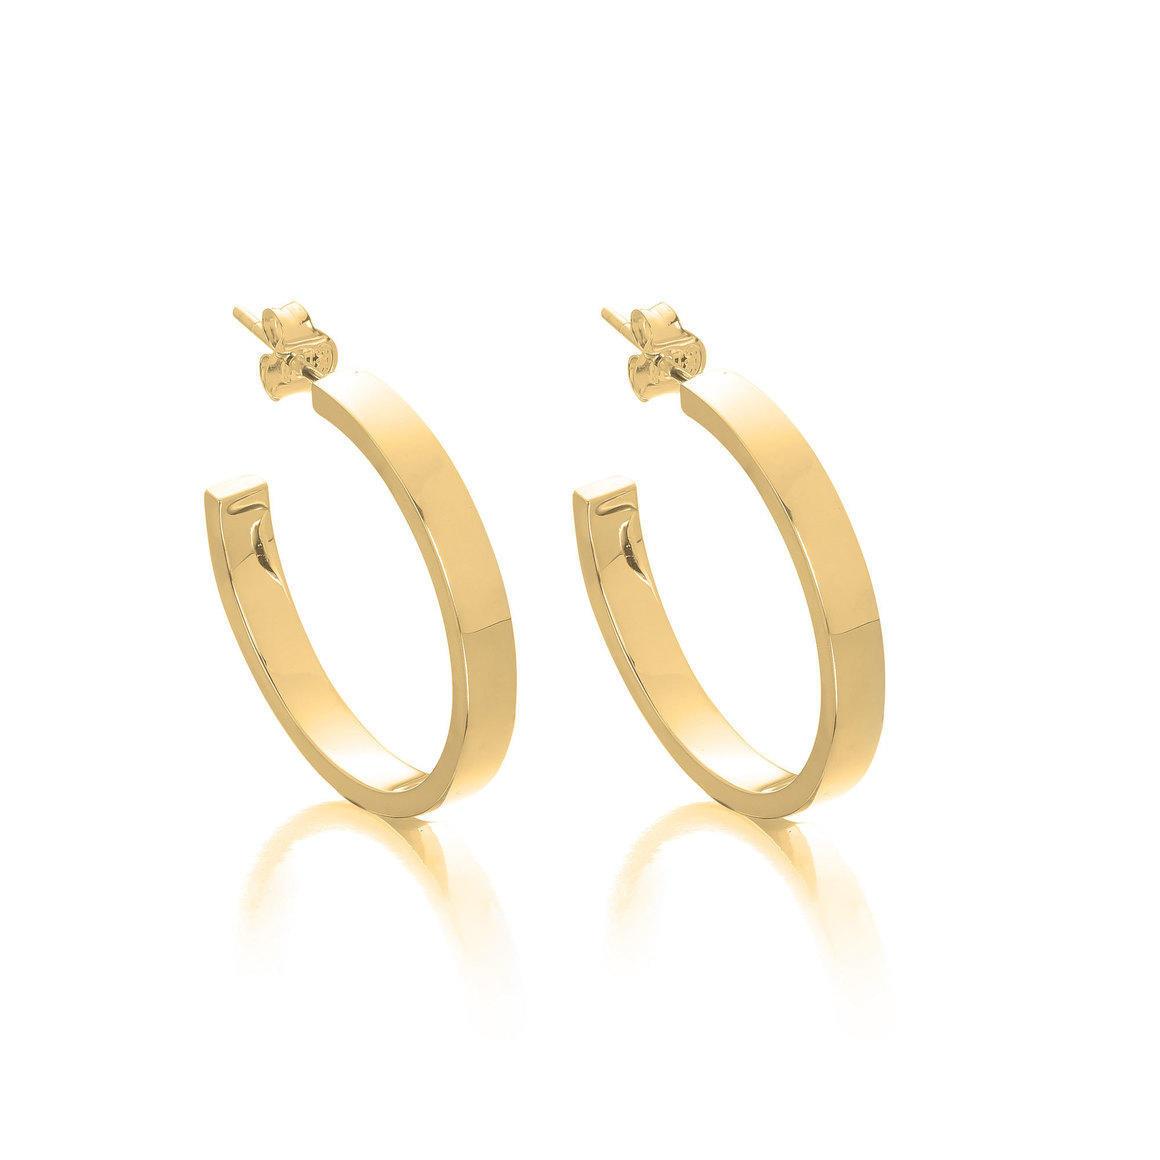 4mm Hoop Earrings | Trada Marketplace